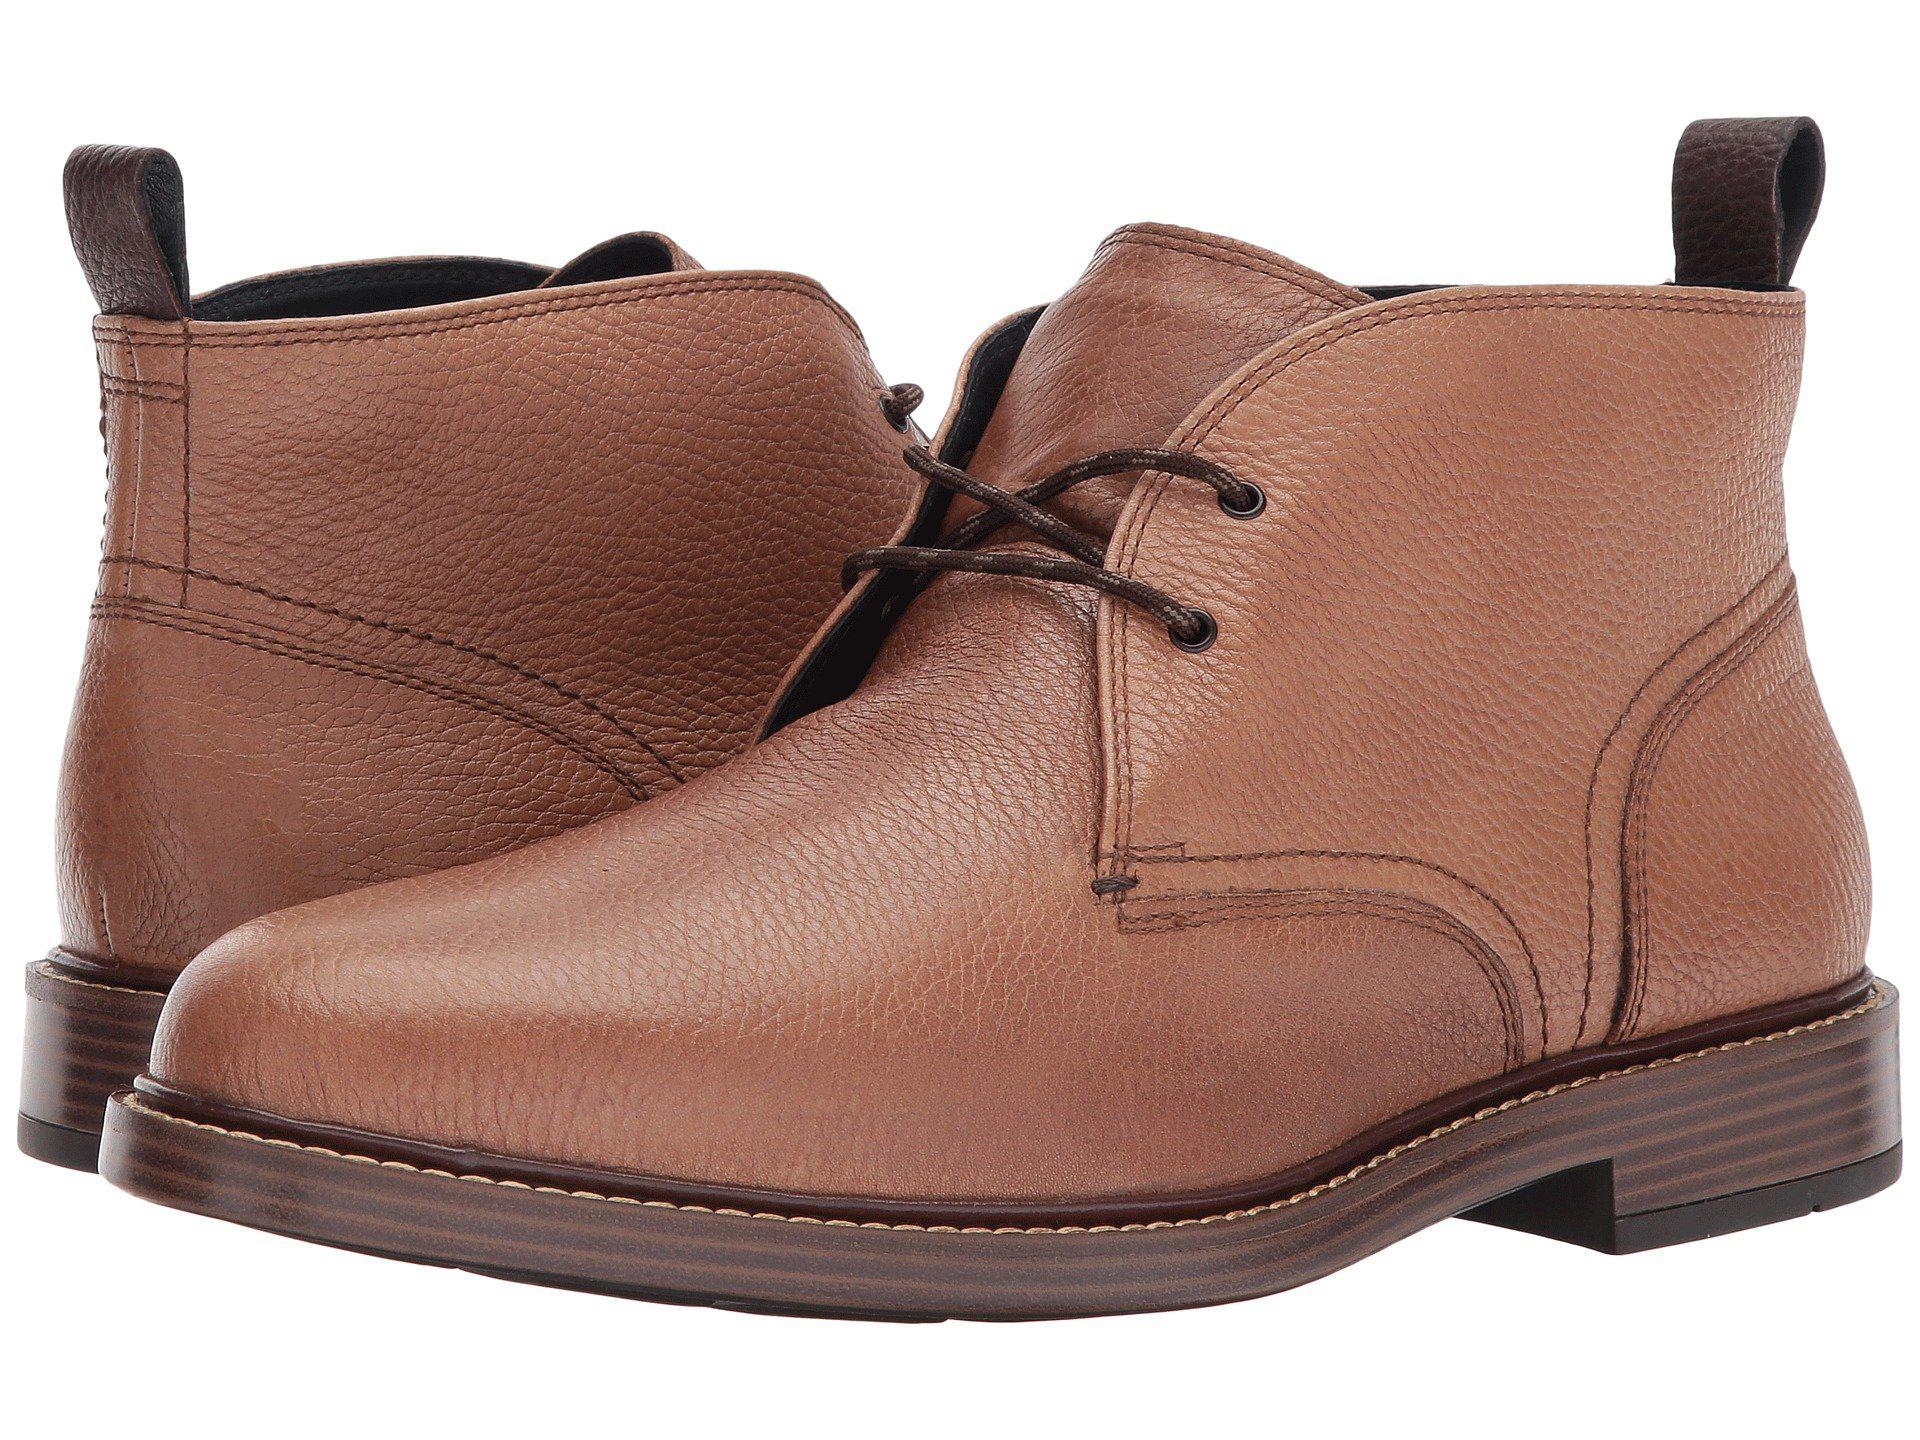 Cole Haan Leather Adams Grand Chukka